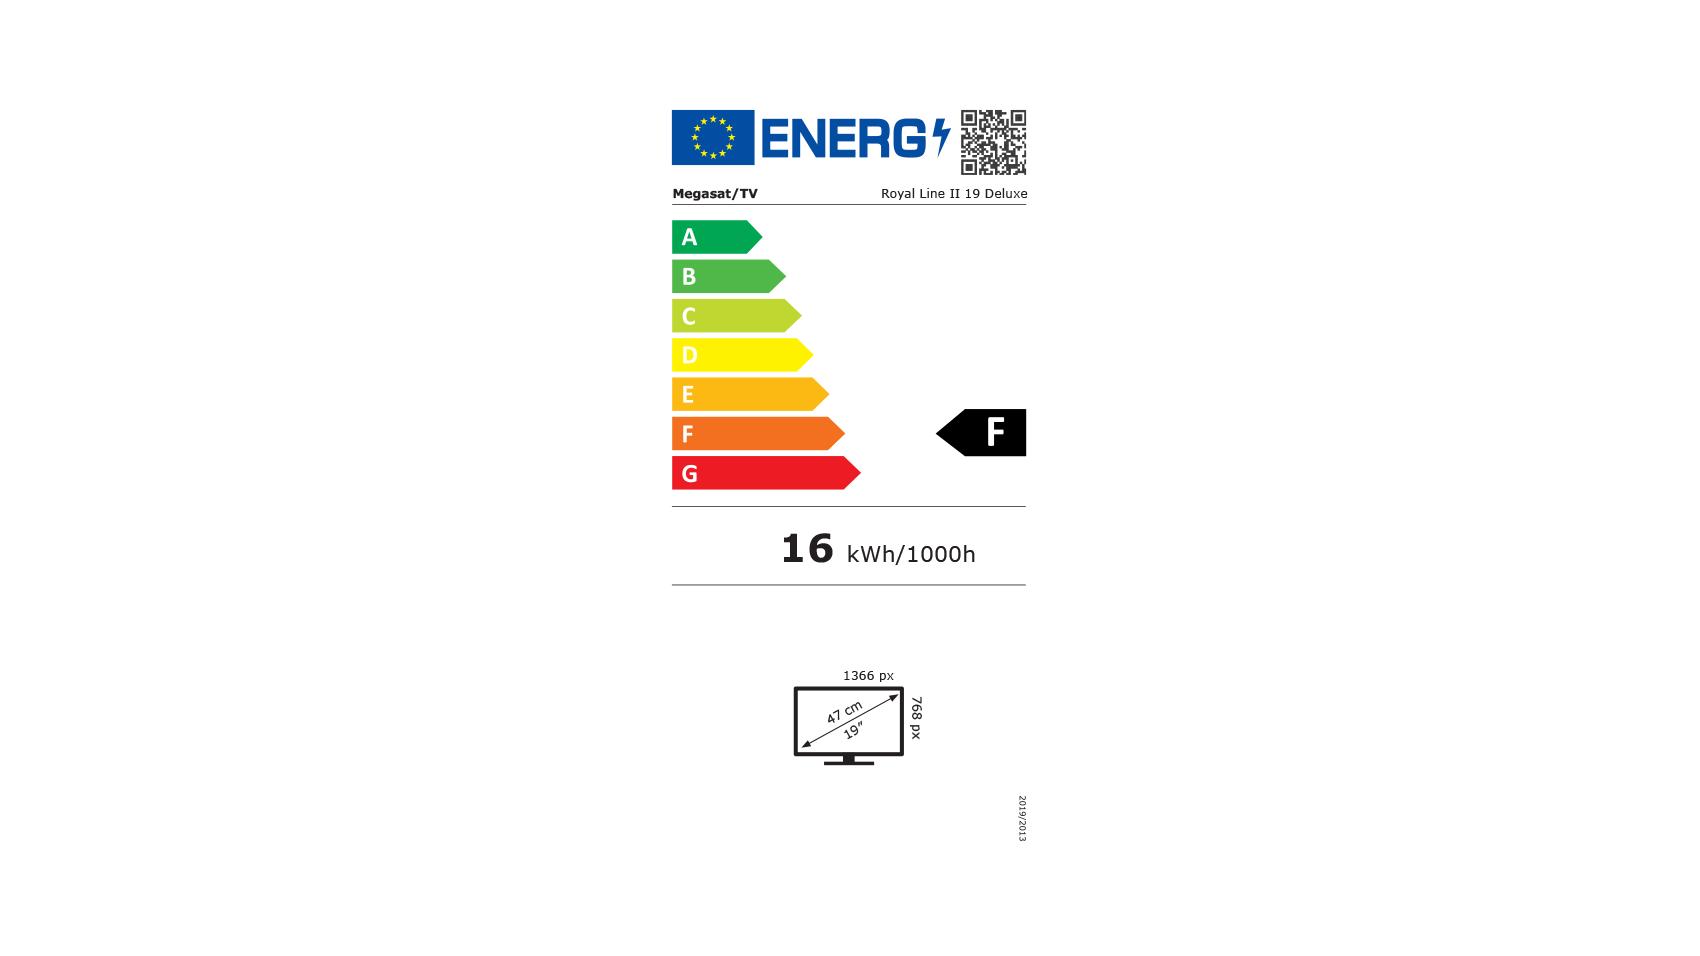 megasat_royal_line_2_19_deluxe_energielabel_2021